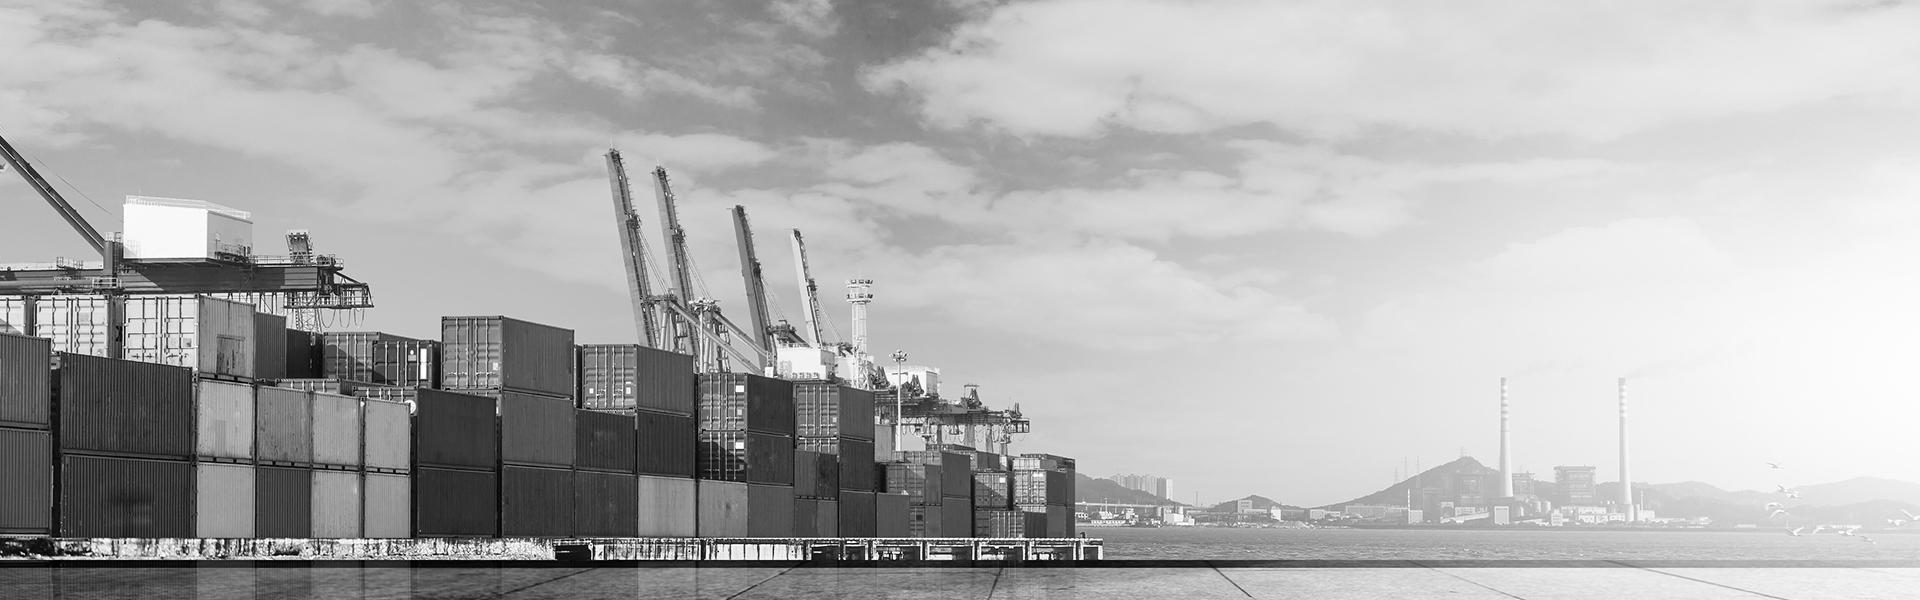 trade*export